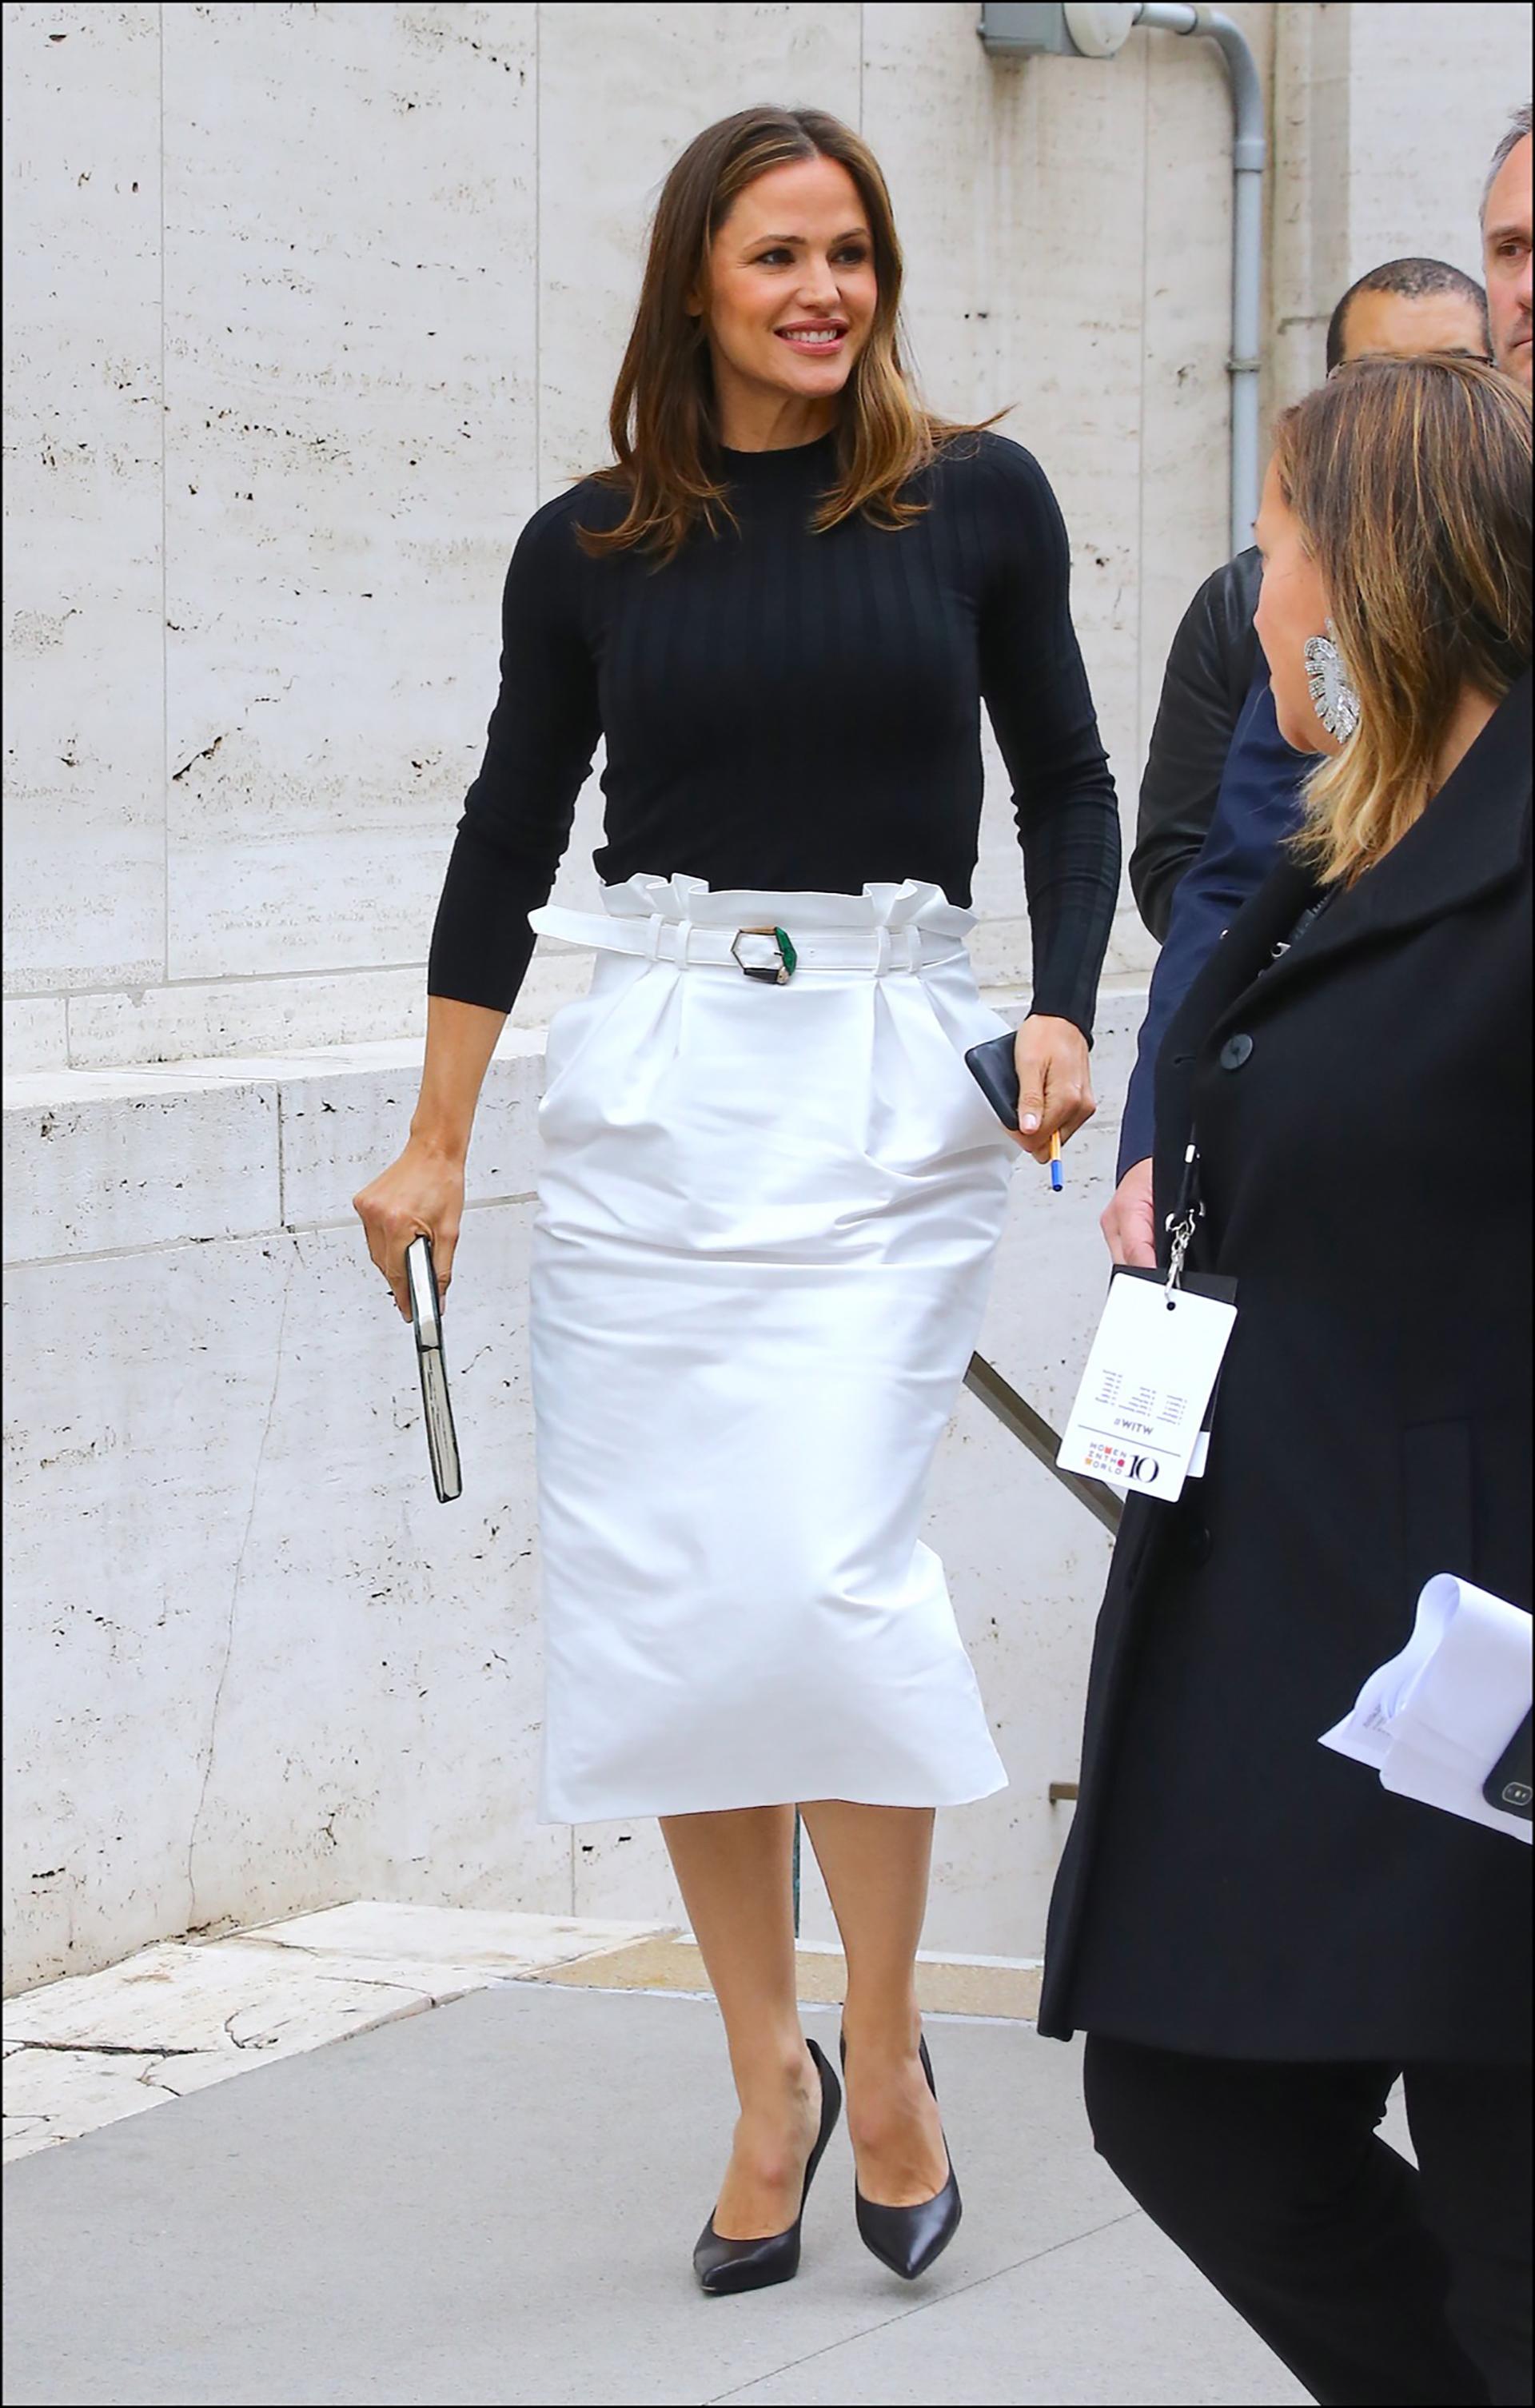 Jennifer Garner ‡ la sortie du Lincoln Center ‡ New York, le 11 avril 2019. Jennifer Garner is leaving the Lincoln Center in New York. April 11th, 2019.